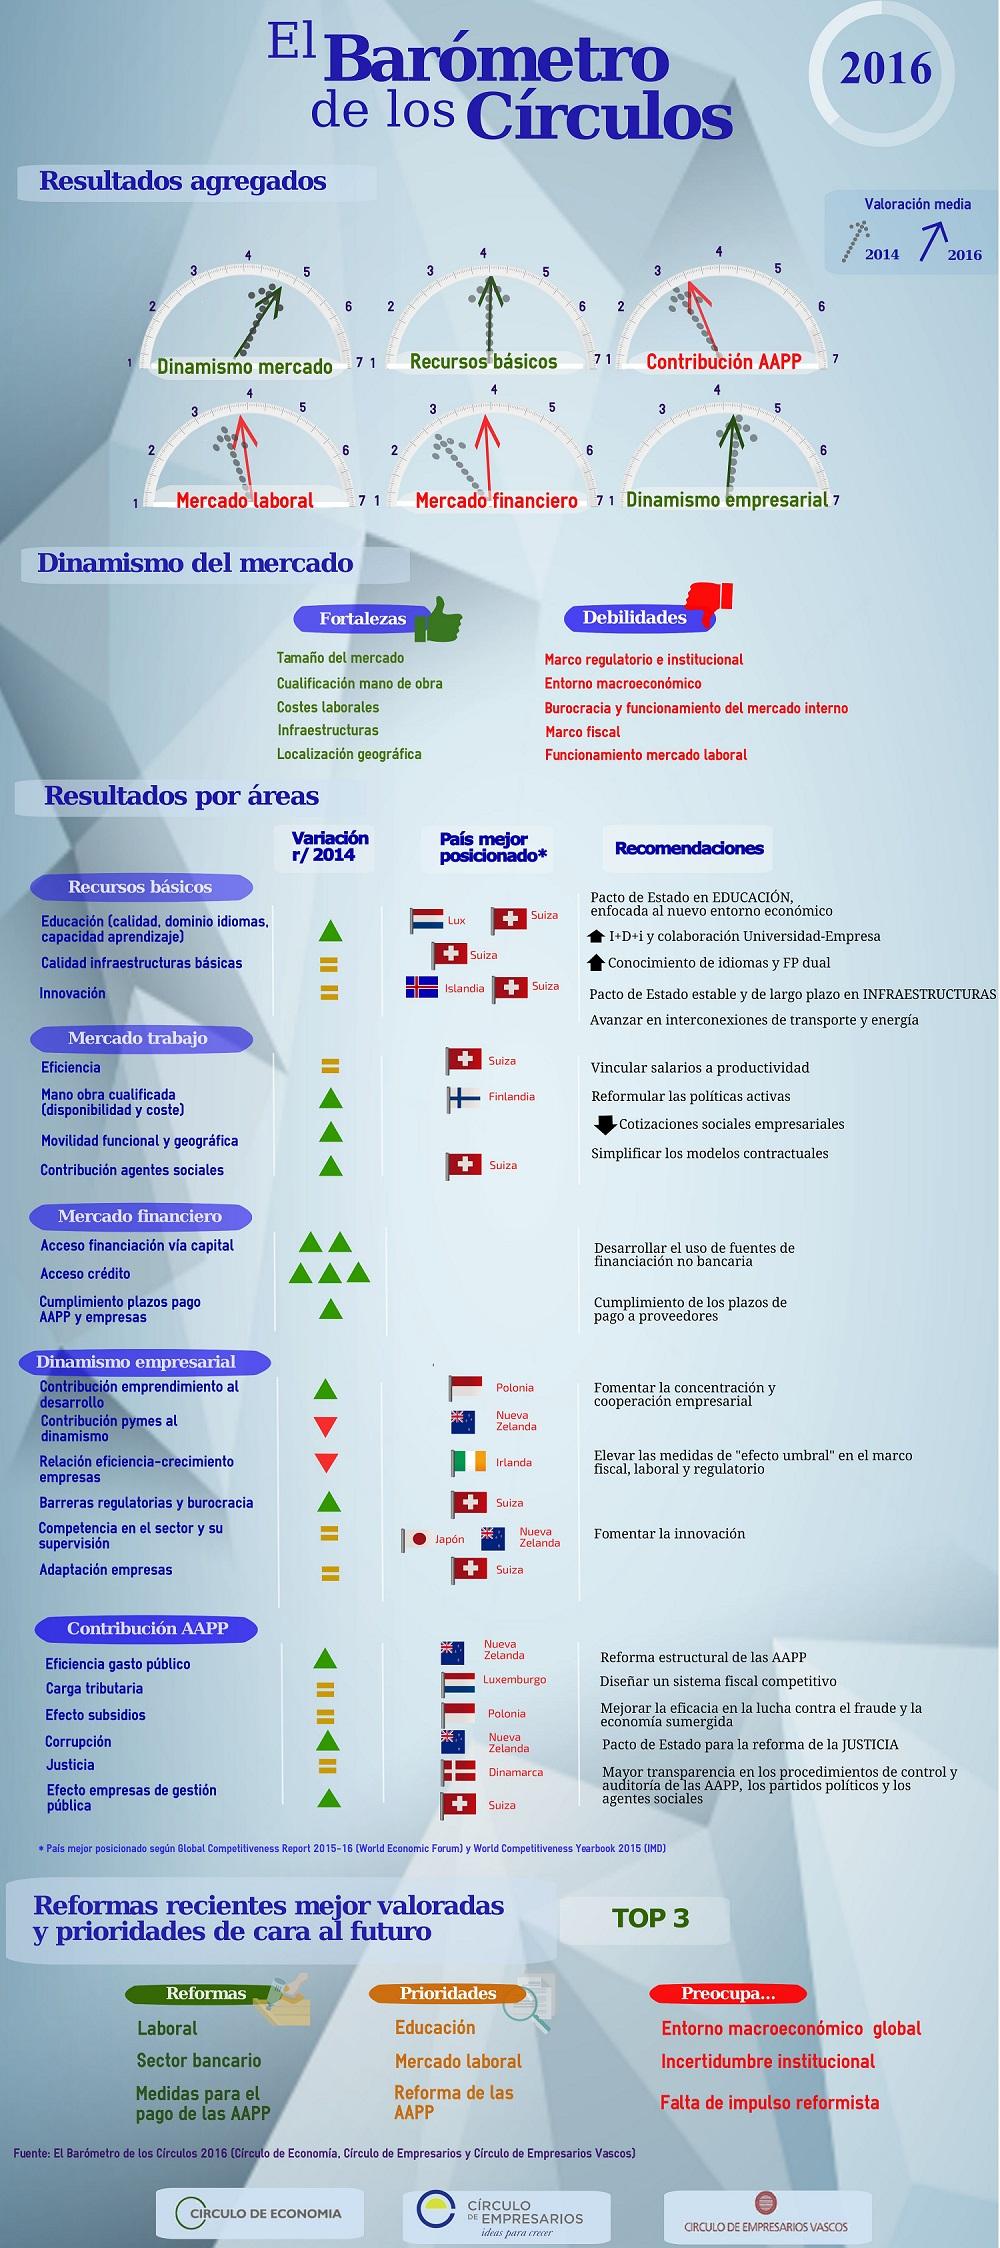 Barómetro_2016_Círculo_de_Empresarios_infografía-1000